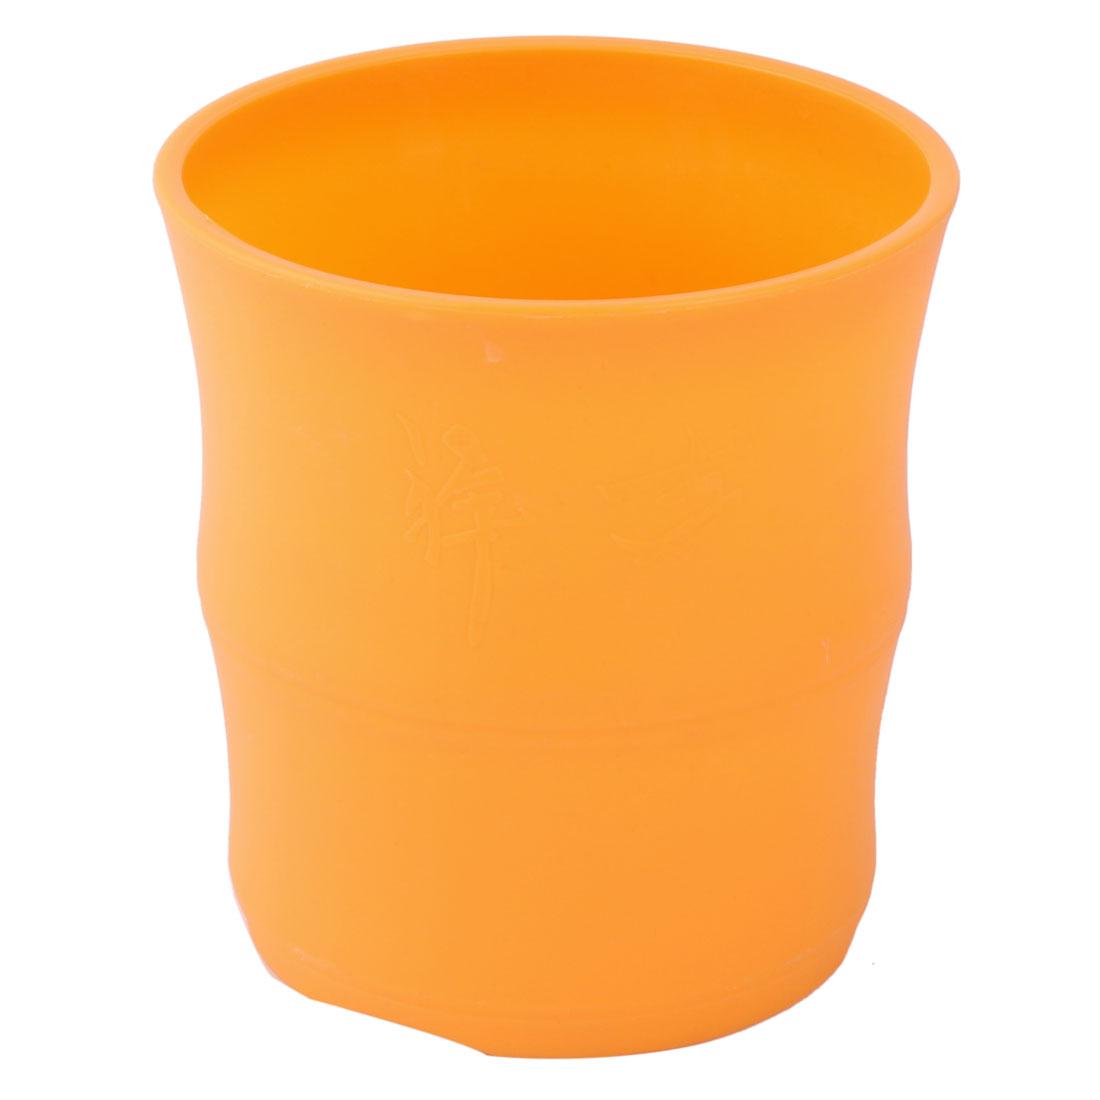 Home Decor Plastic Round Flower Aloes Cactus Plant Pot Holder Container Orange